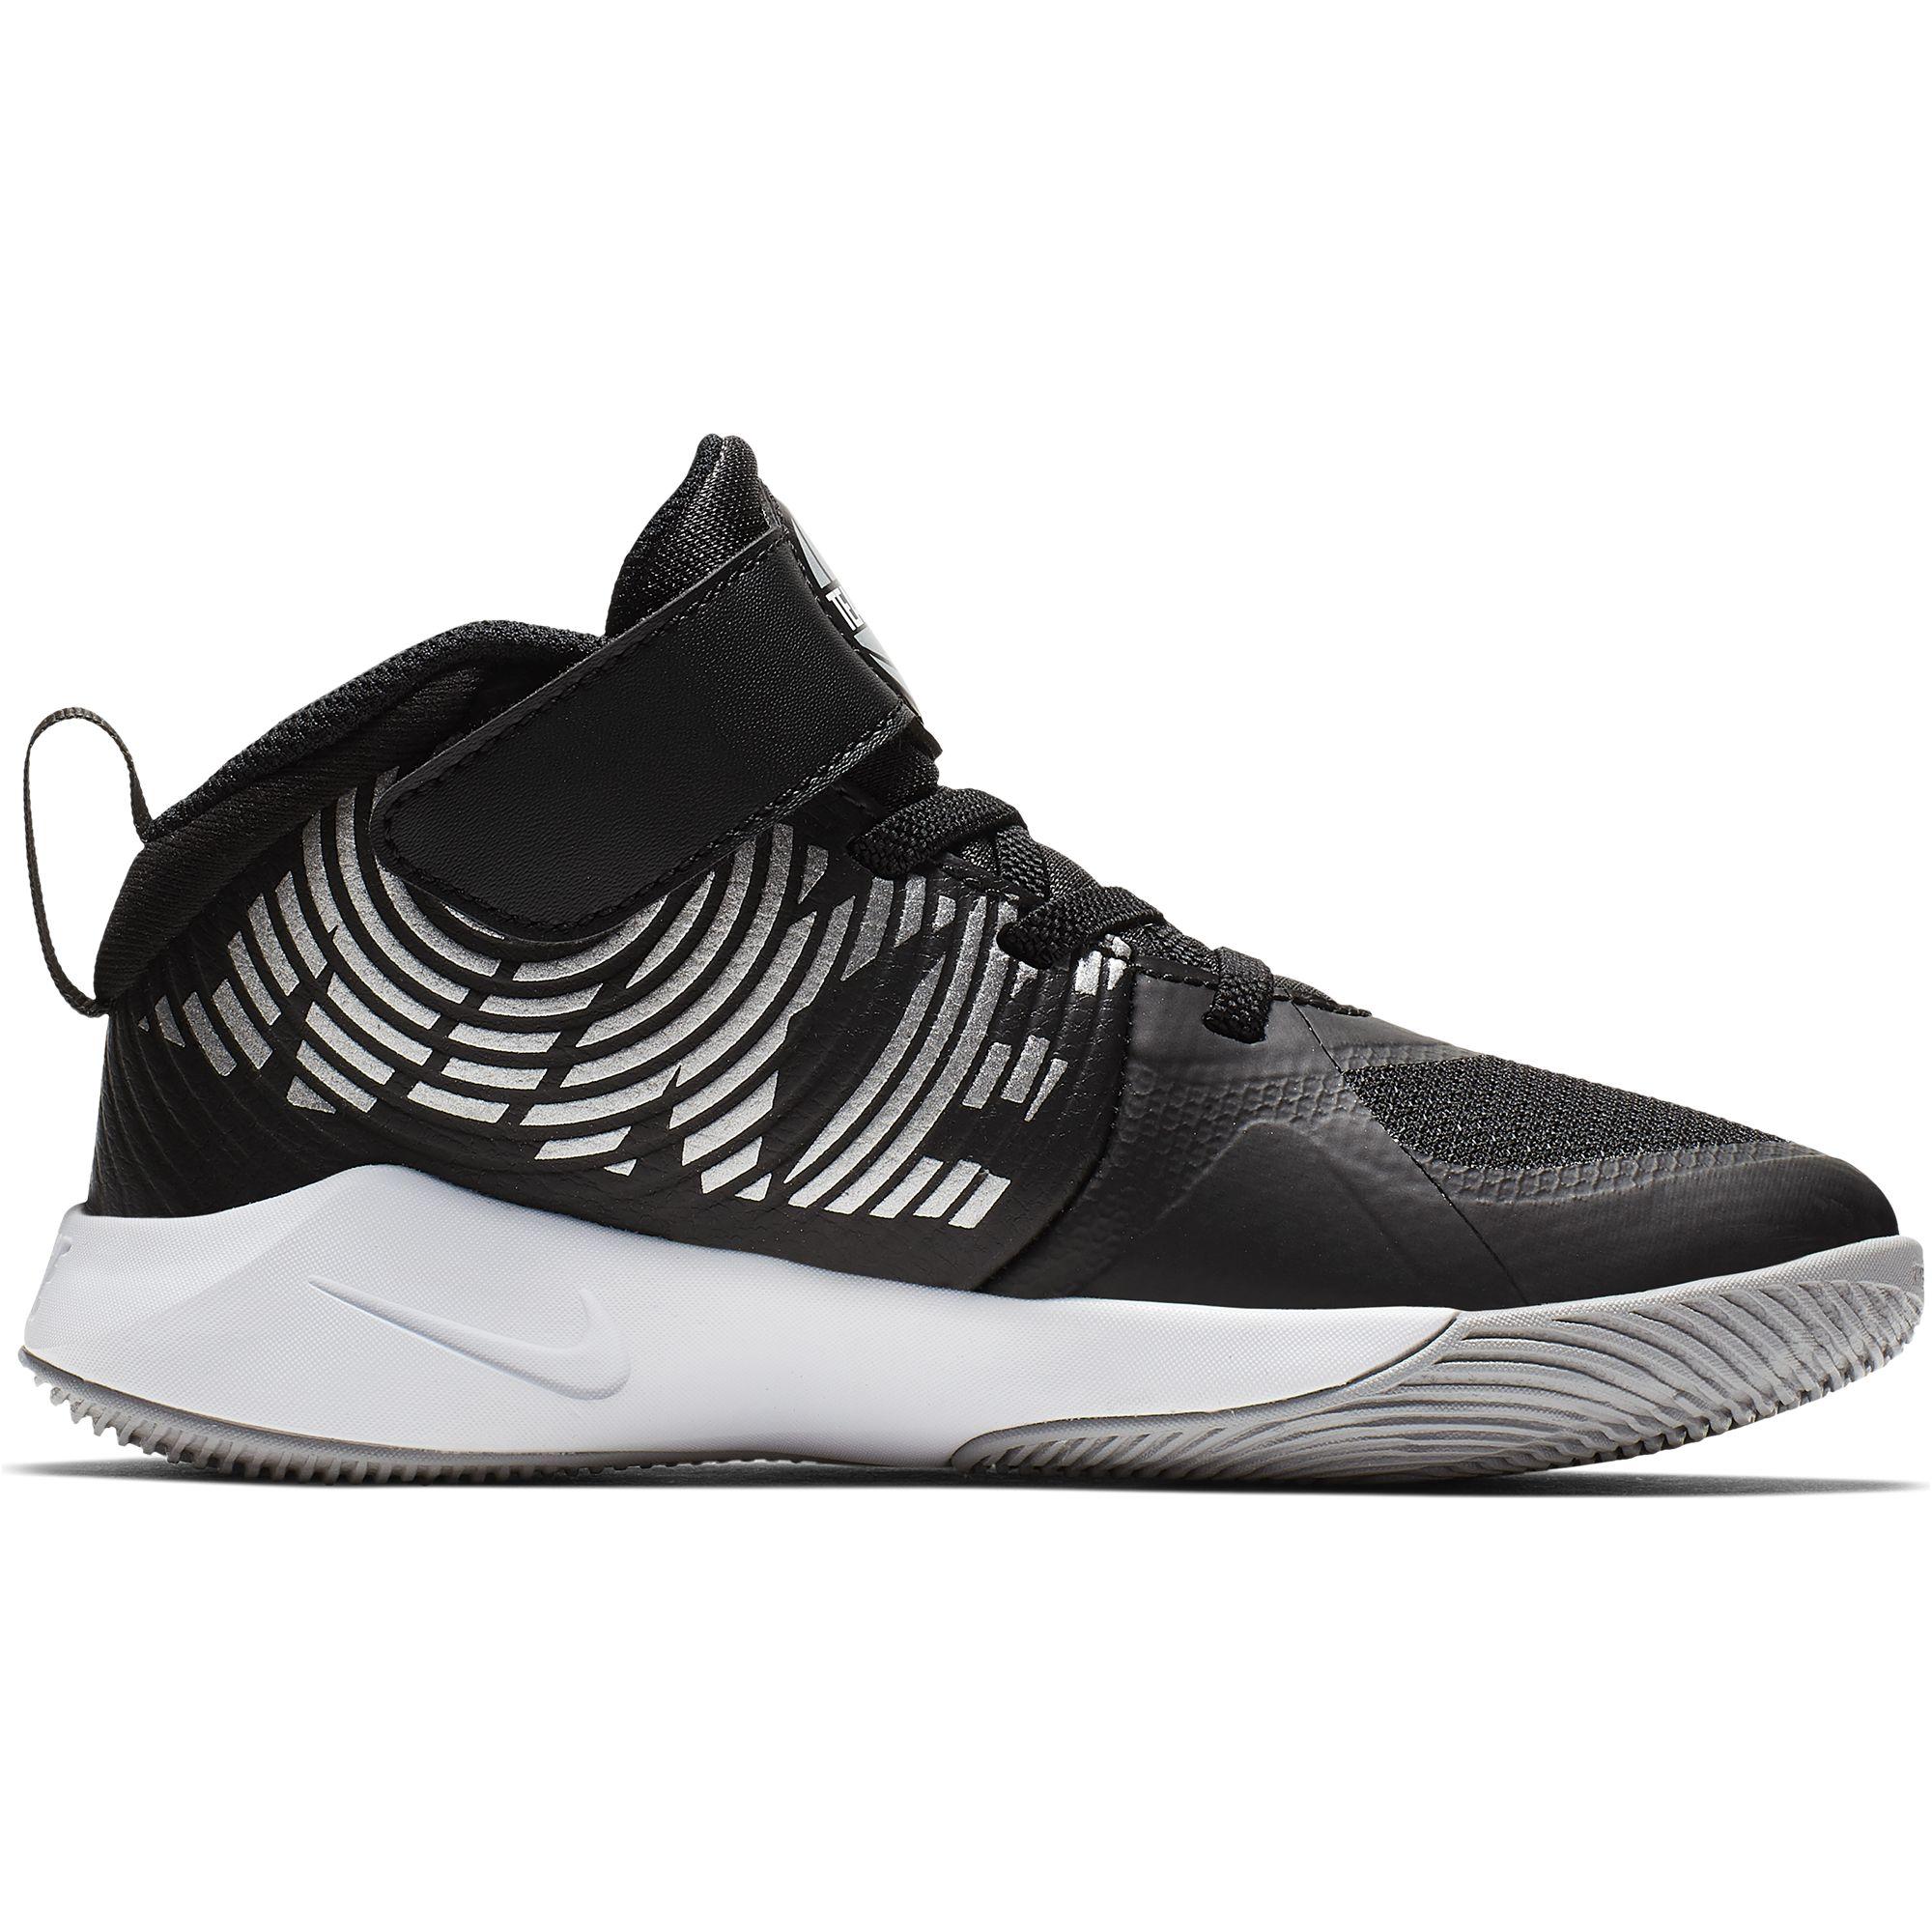 imitar techo A bordo  Boy's Nike Team Hustle D9 (PS) Basketball Shoe | eBay